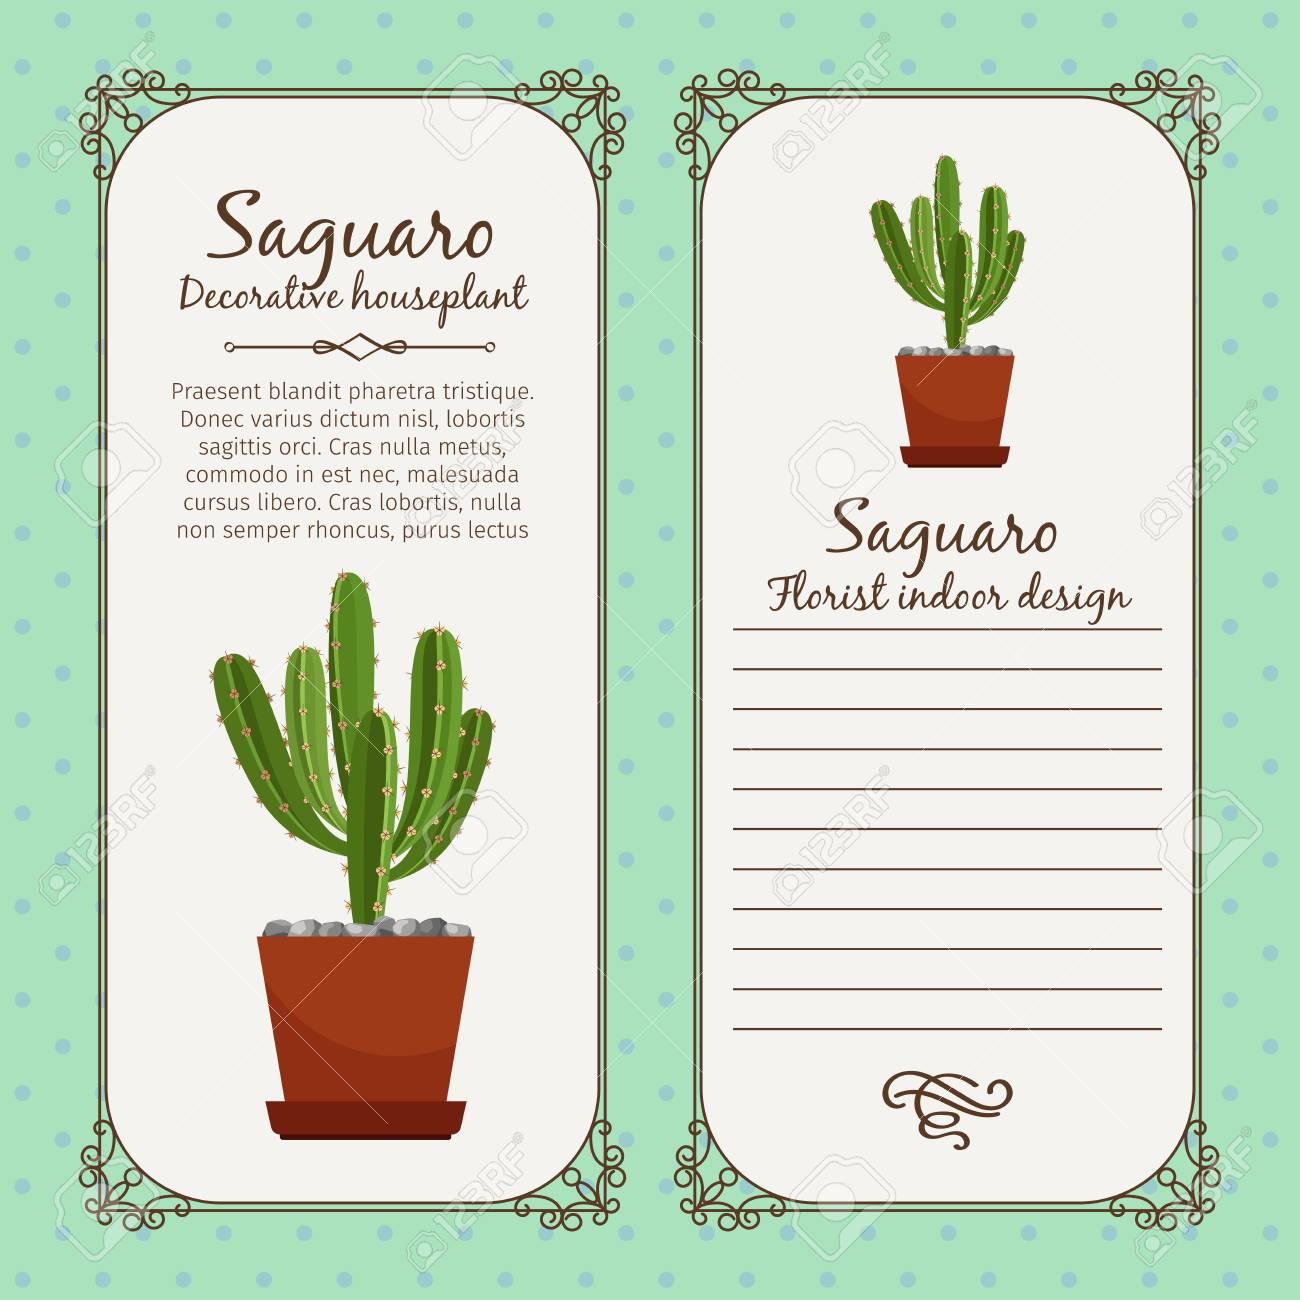 Vector Vintage Label Template With Decorative Saguaro Plant In Pot Illustration Jpg 1300x1300 Flower